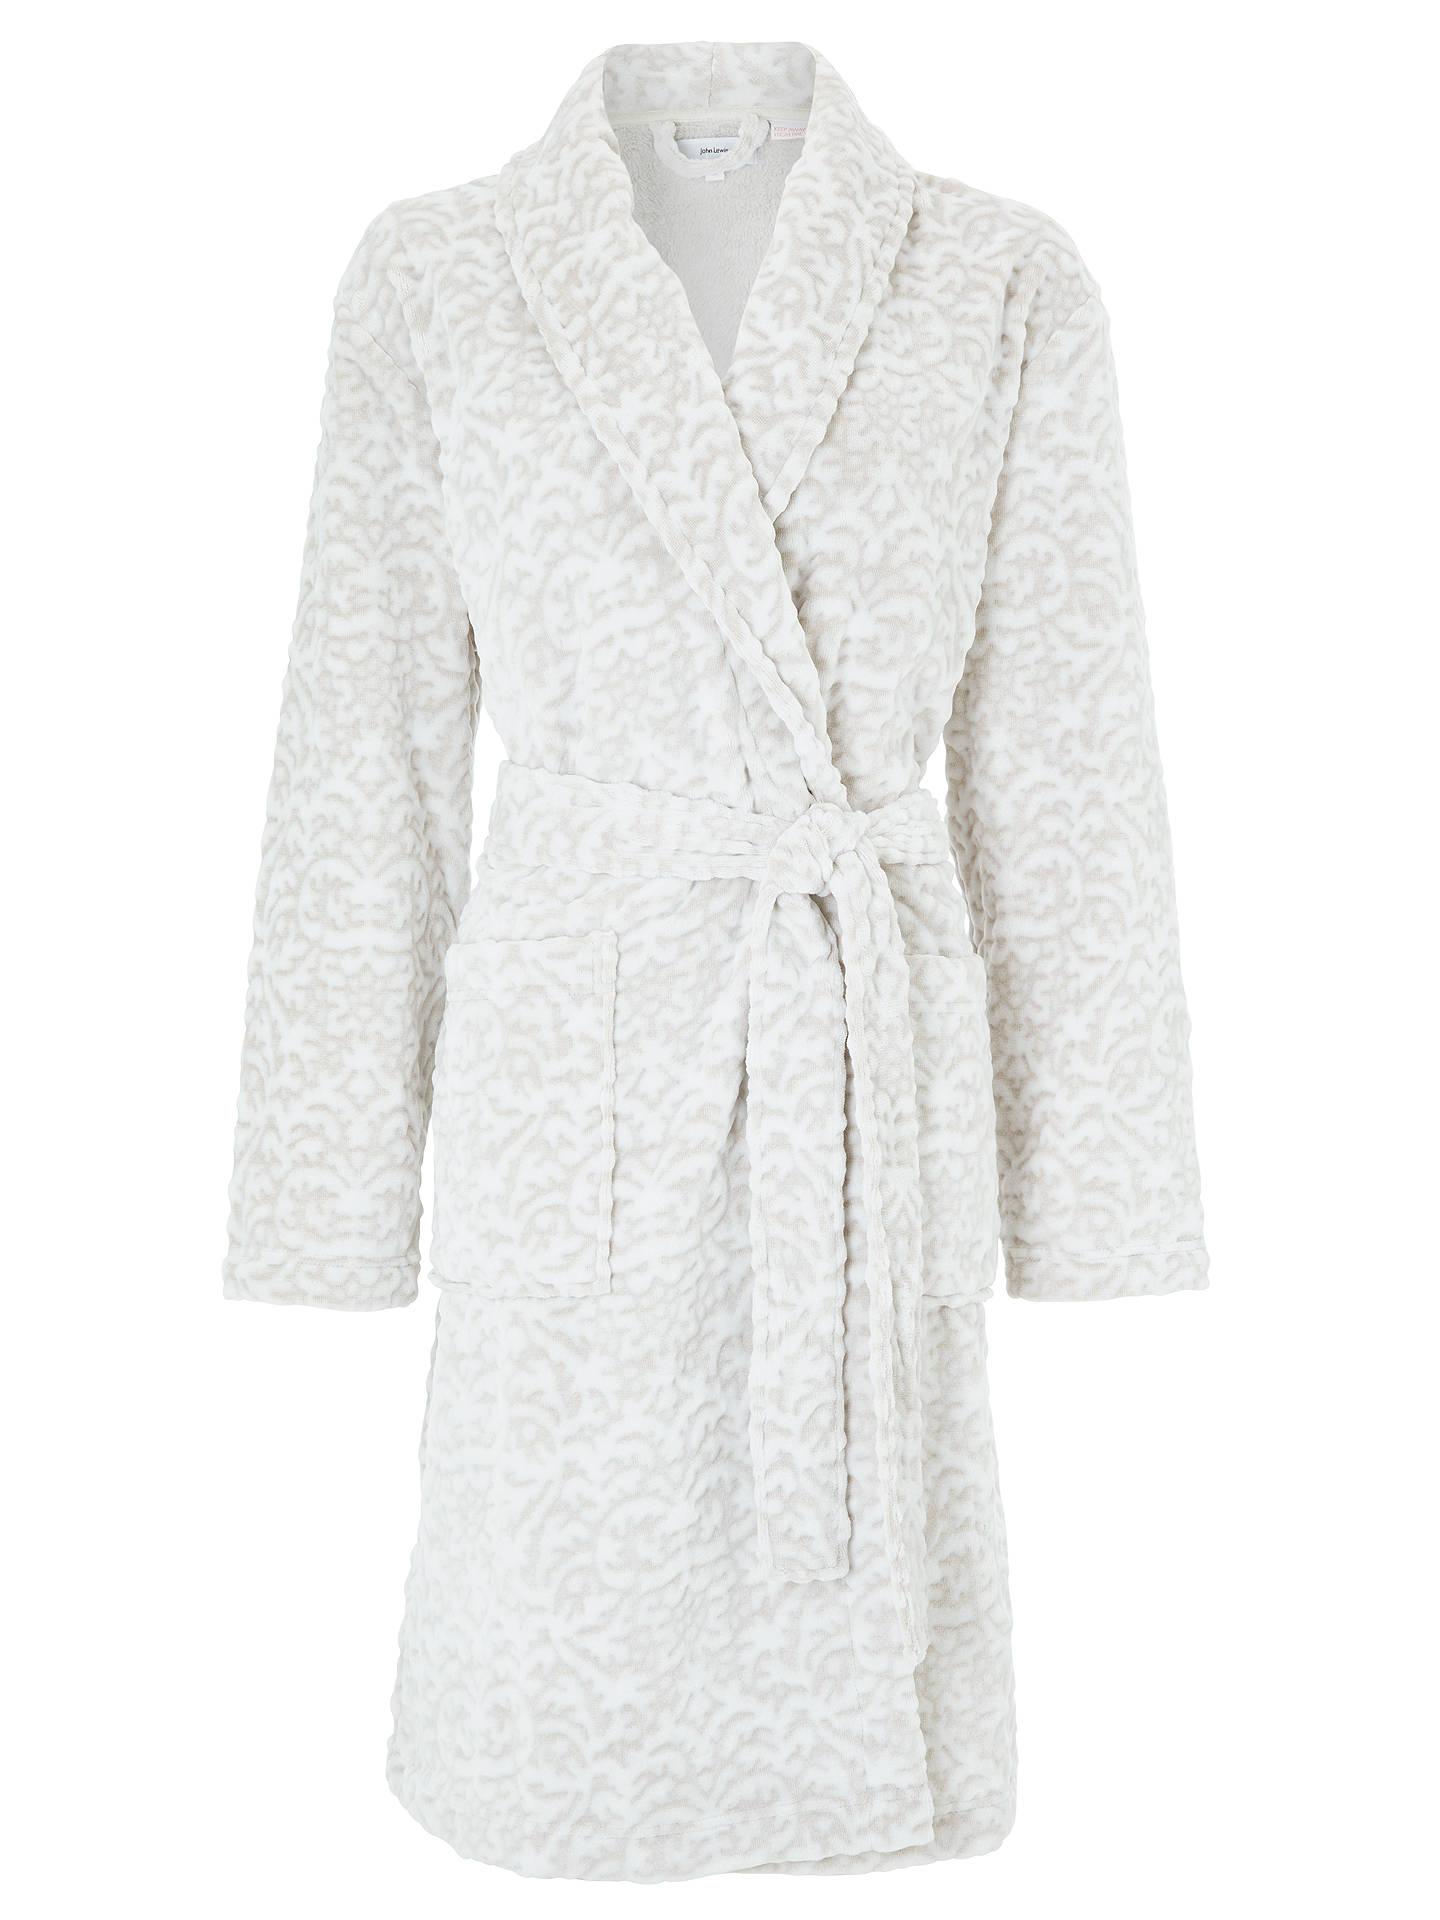 John Lewis Partners Lyra Damask Embossed Fleece Dressing Gown